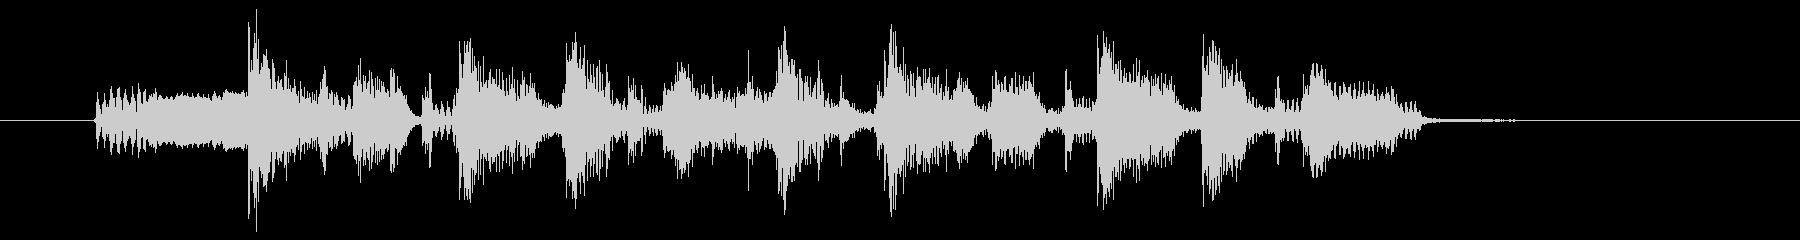 Funk by guitar cutting's unreproduced waveform